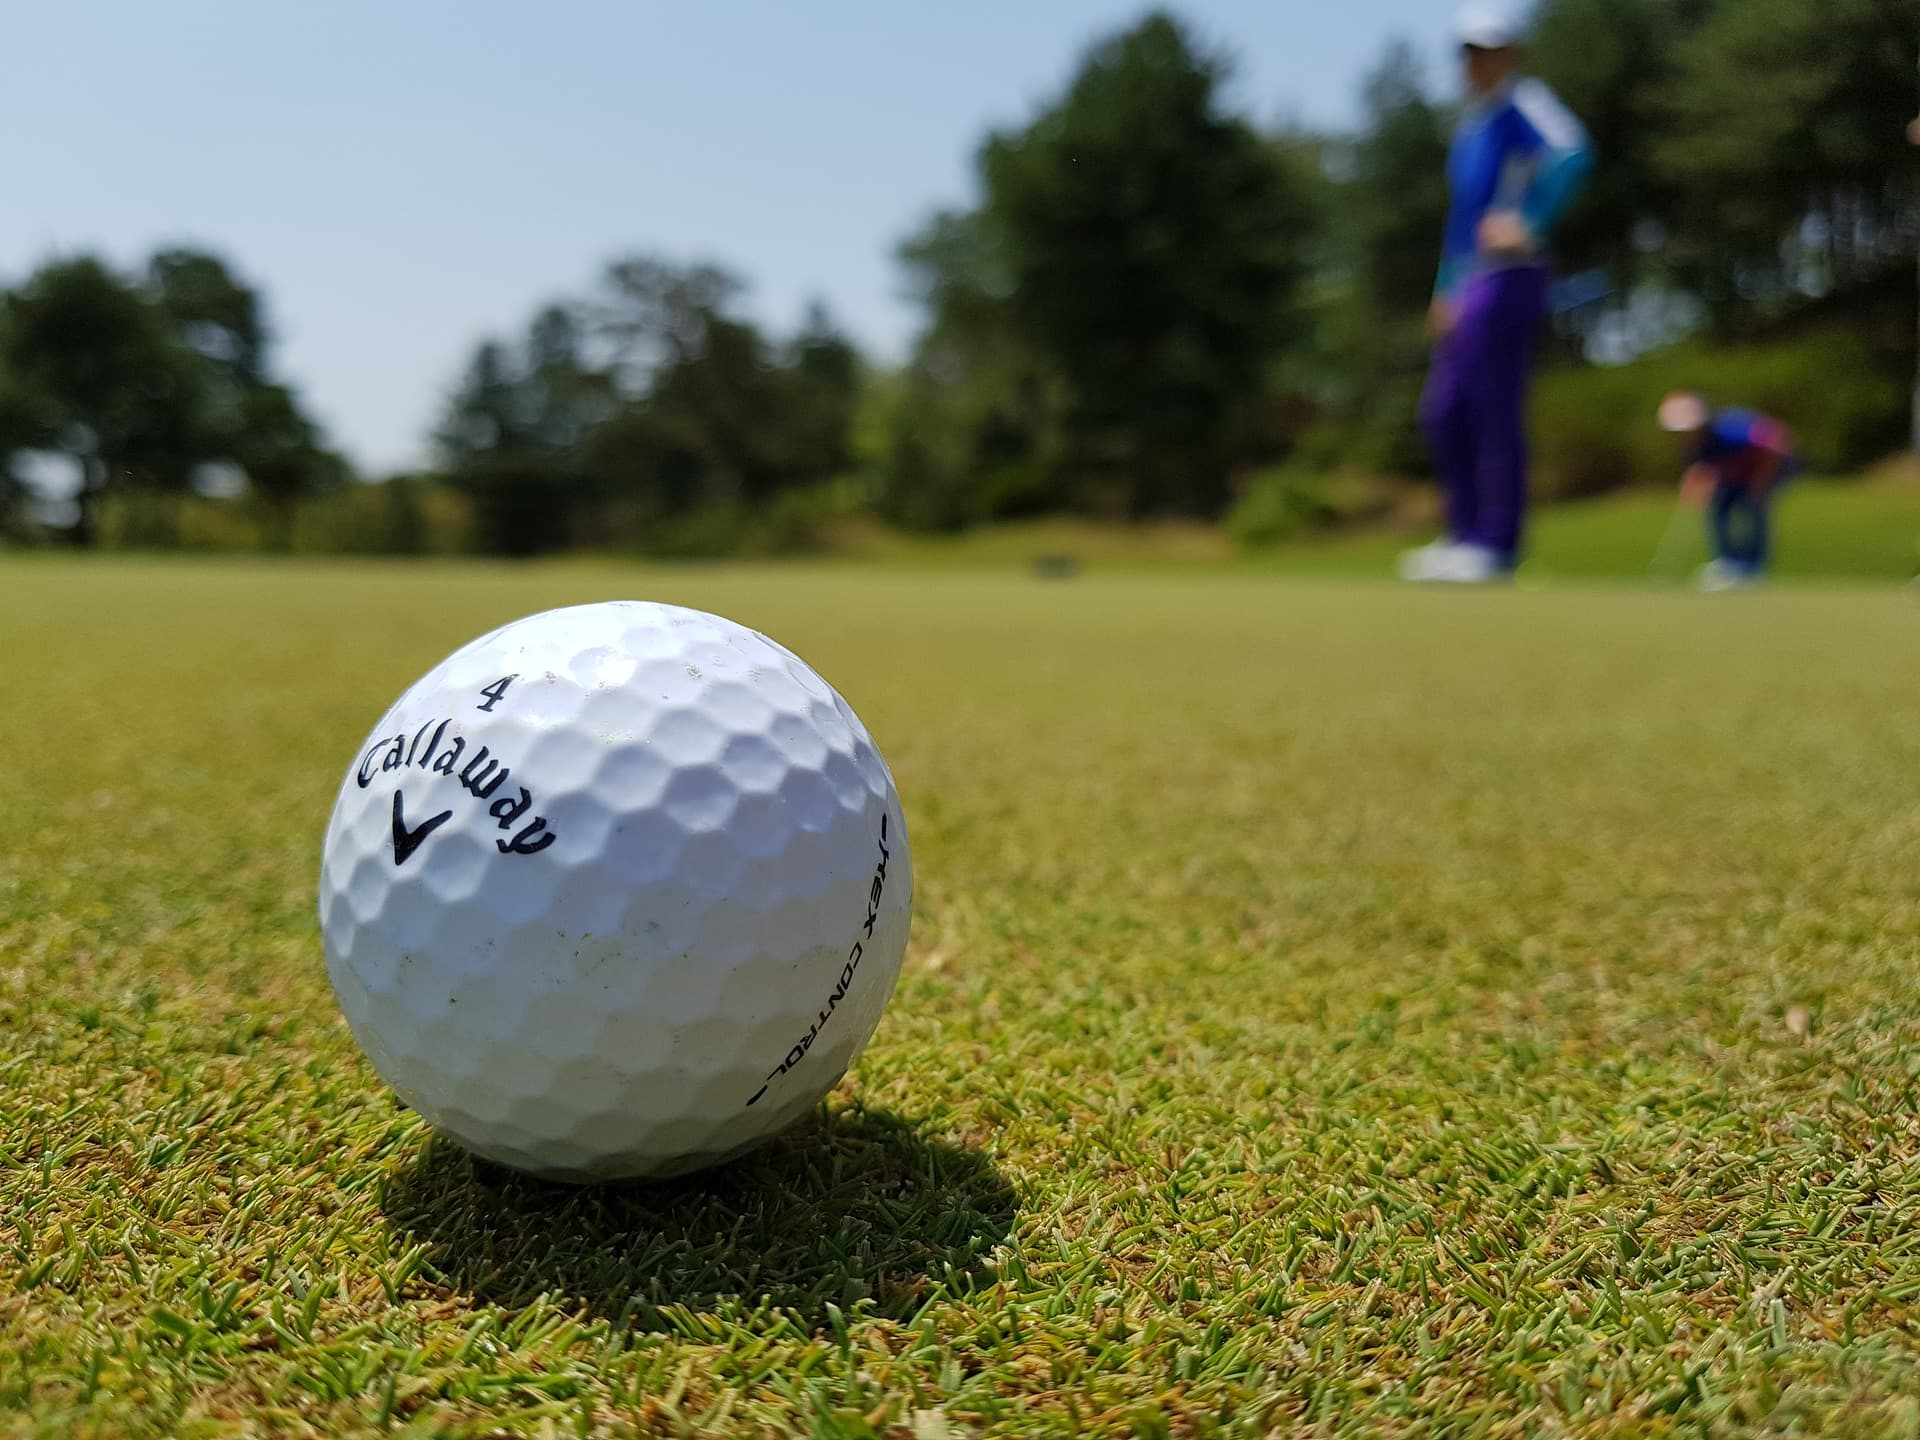 A man playing golf.